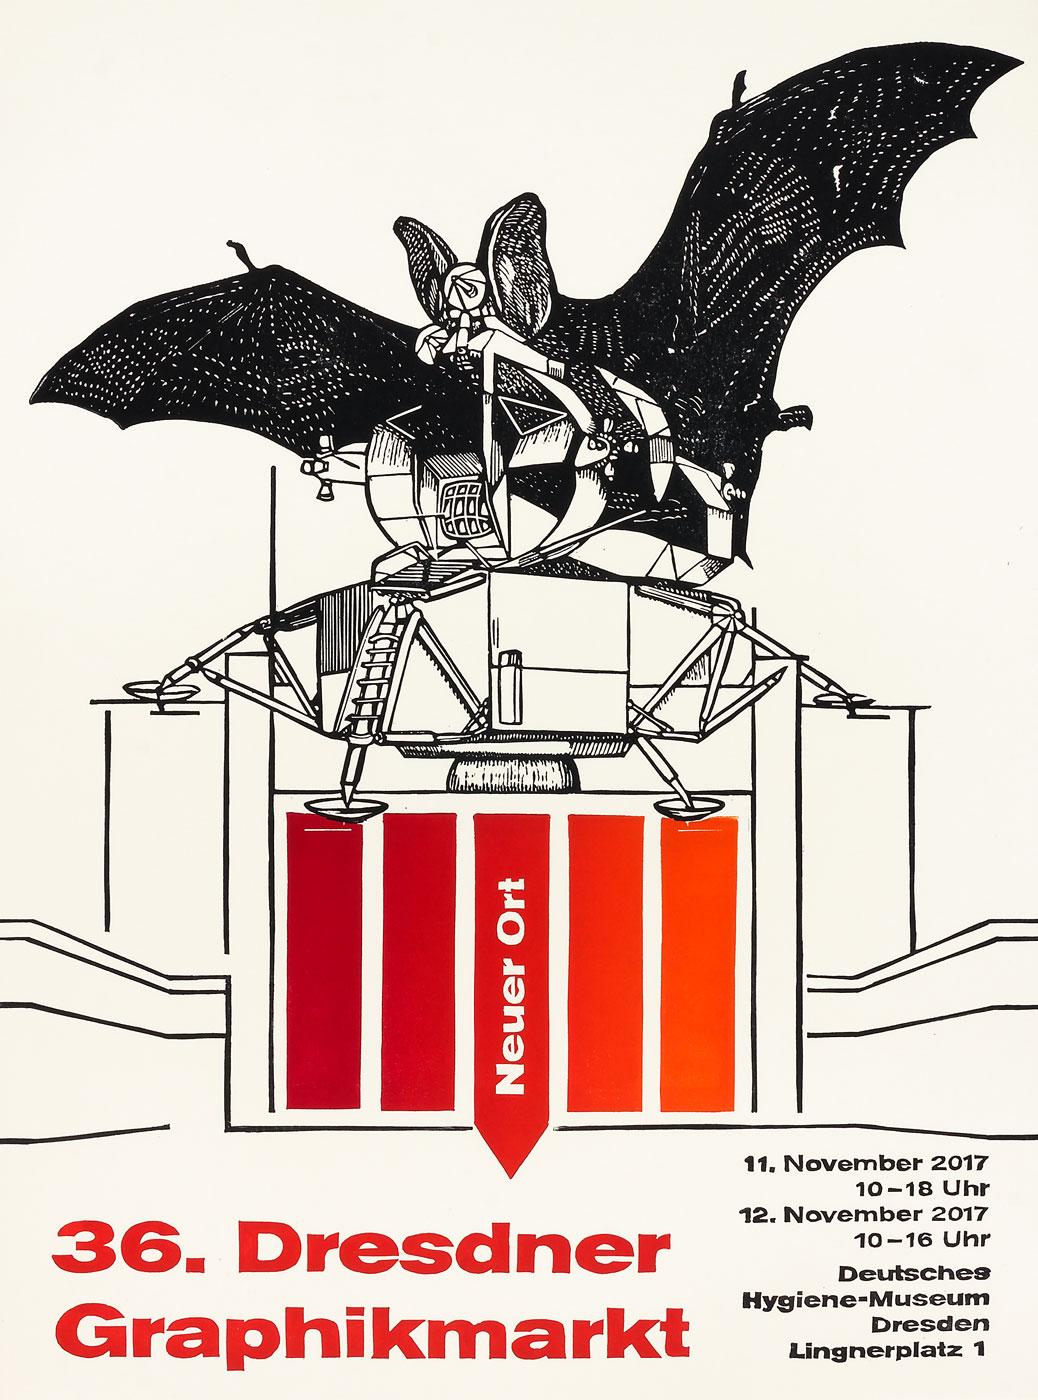 Plakat 36. Dresdner Graphikmarkt 2017, Stephanie Marx, Linolschnitt